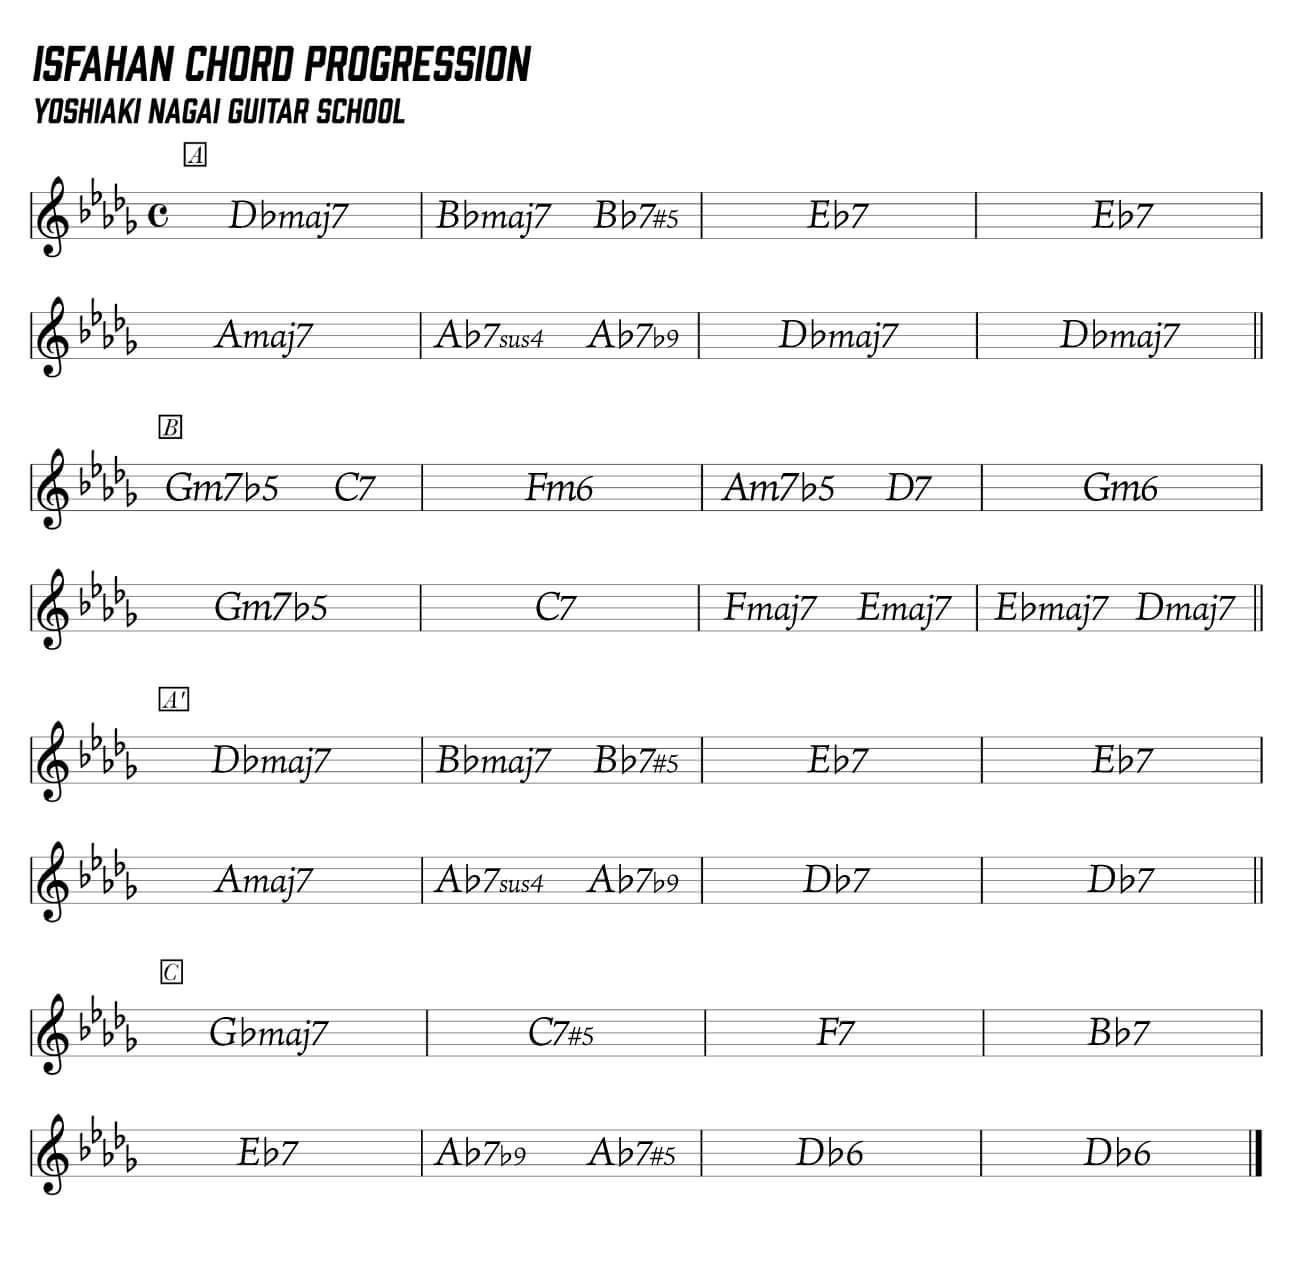 jesse-van-ruller,ジャズギター,分析,isfahan,コード進行